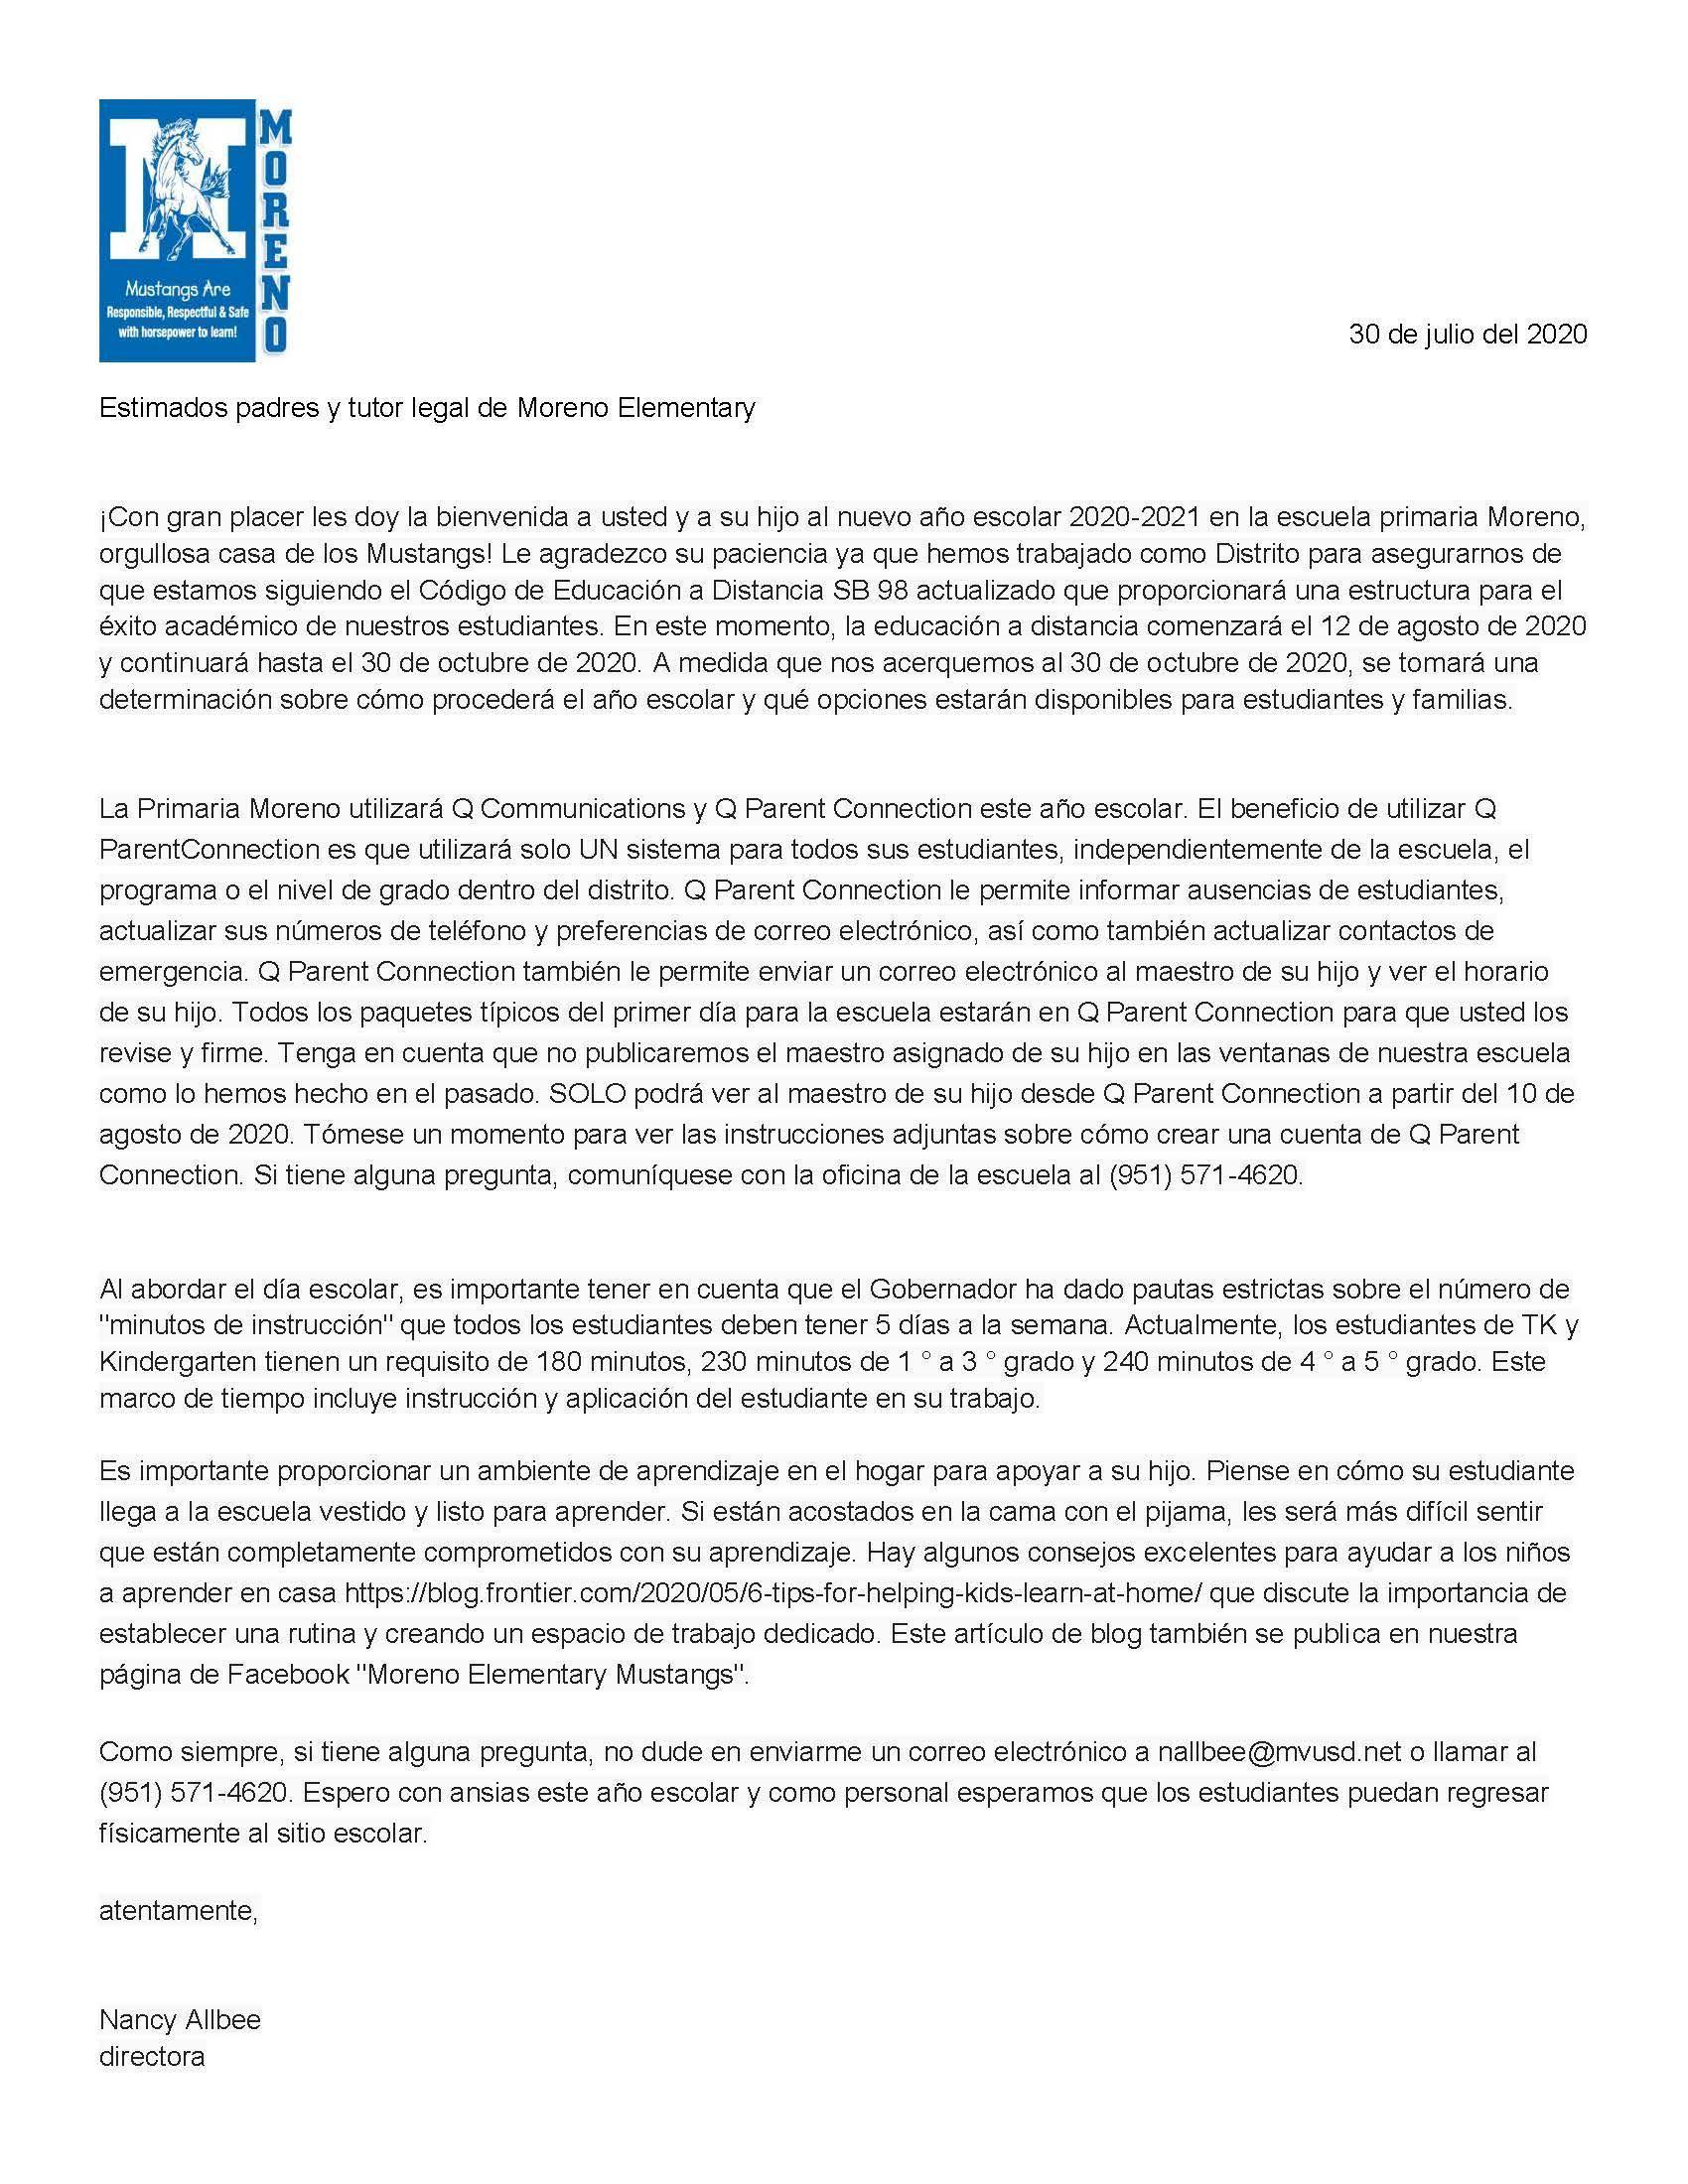 Principal Letter Spanish